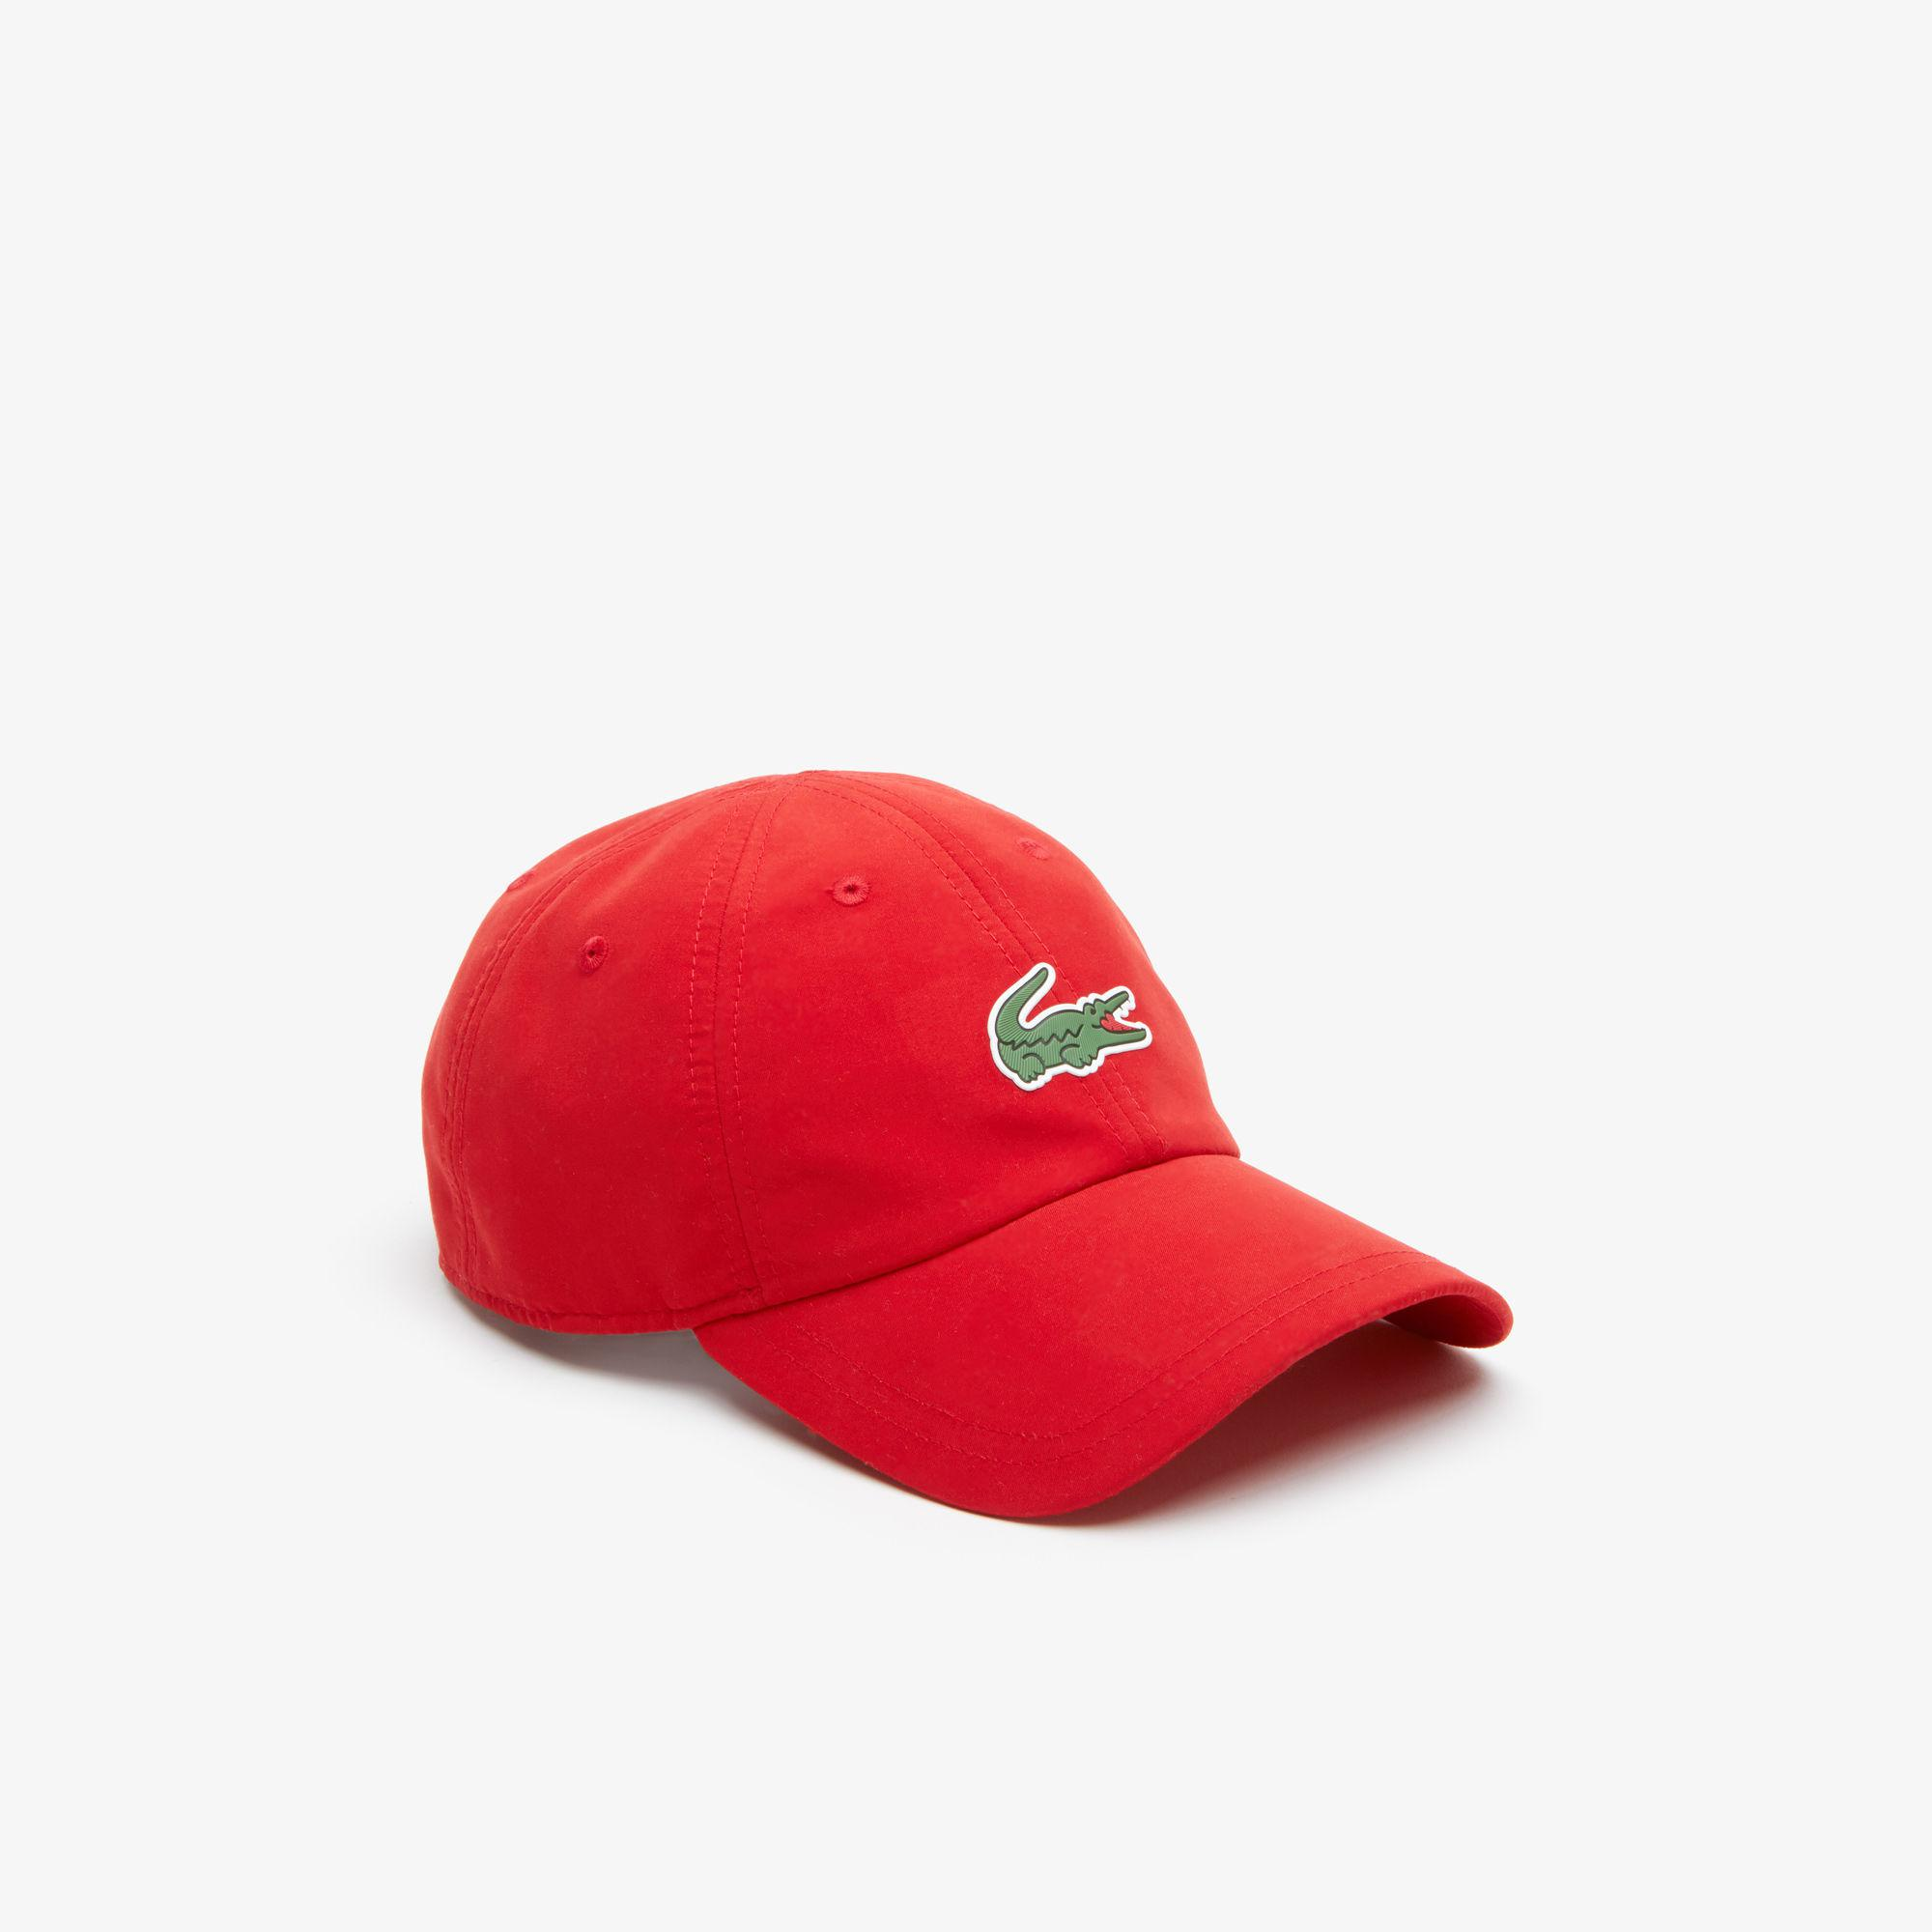 Lyst - Lacoste Sport Tennis Microfiber Crocodile Cap in Red for Men 98d43ef04354